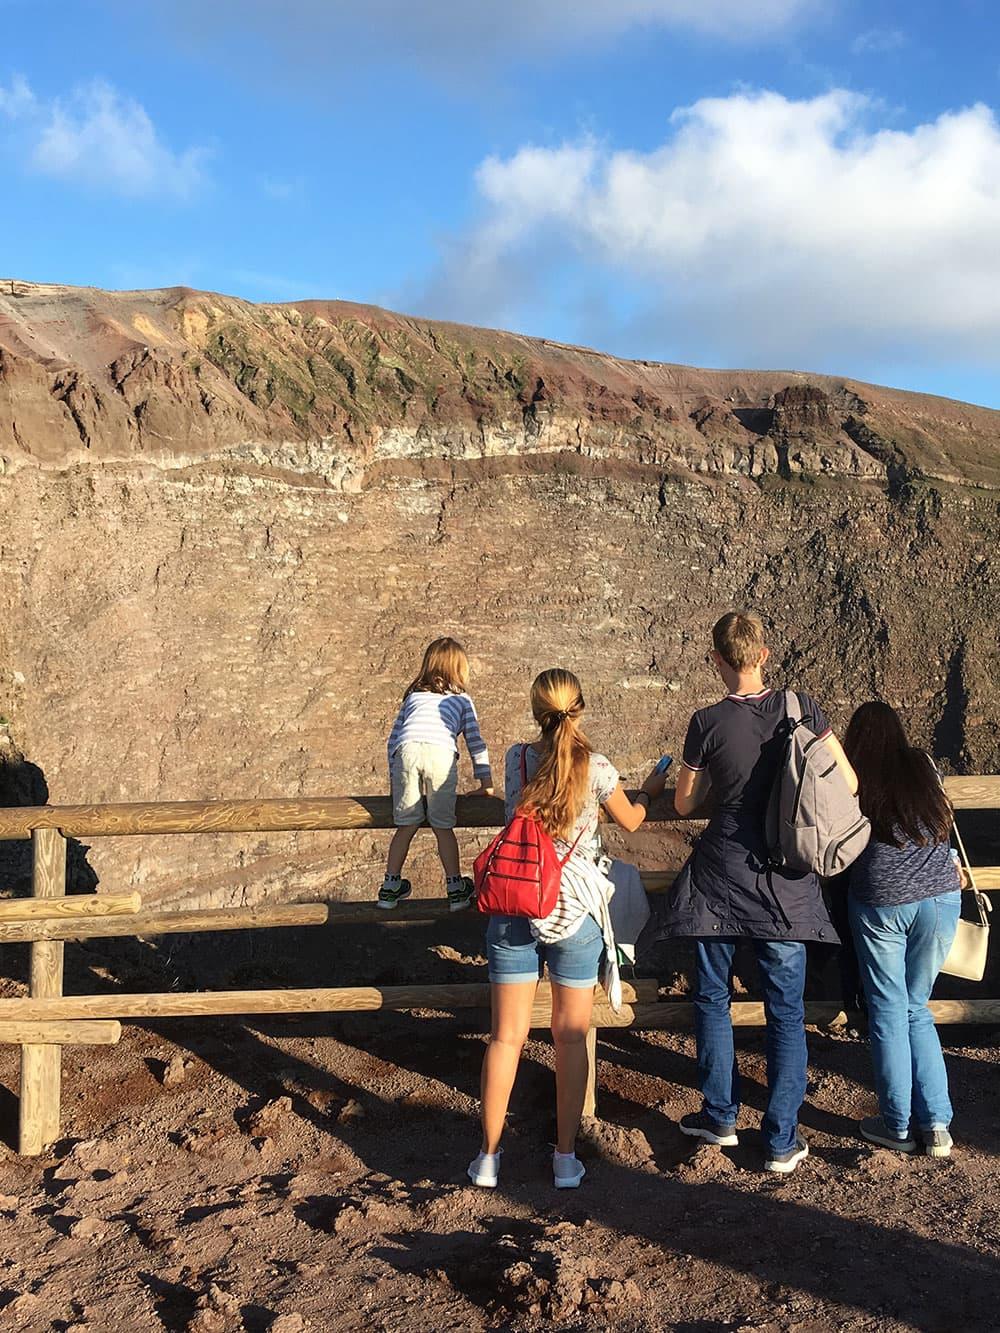 Tourists looking into Vesuvius's crater